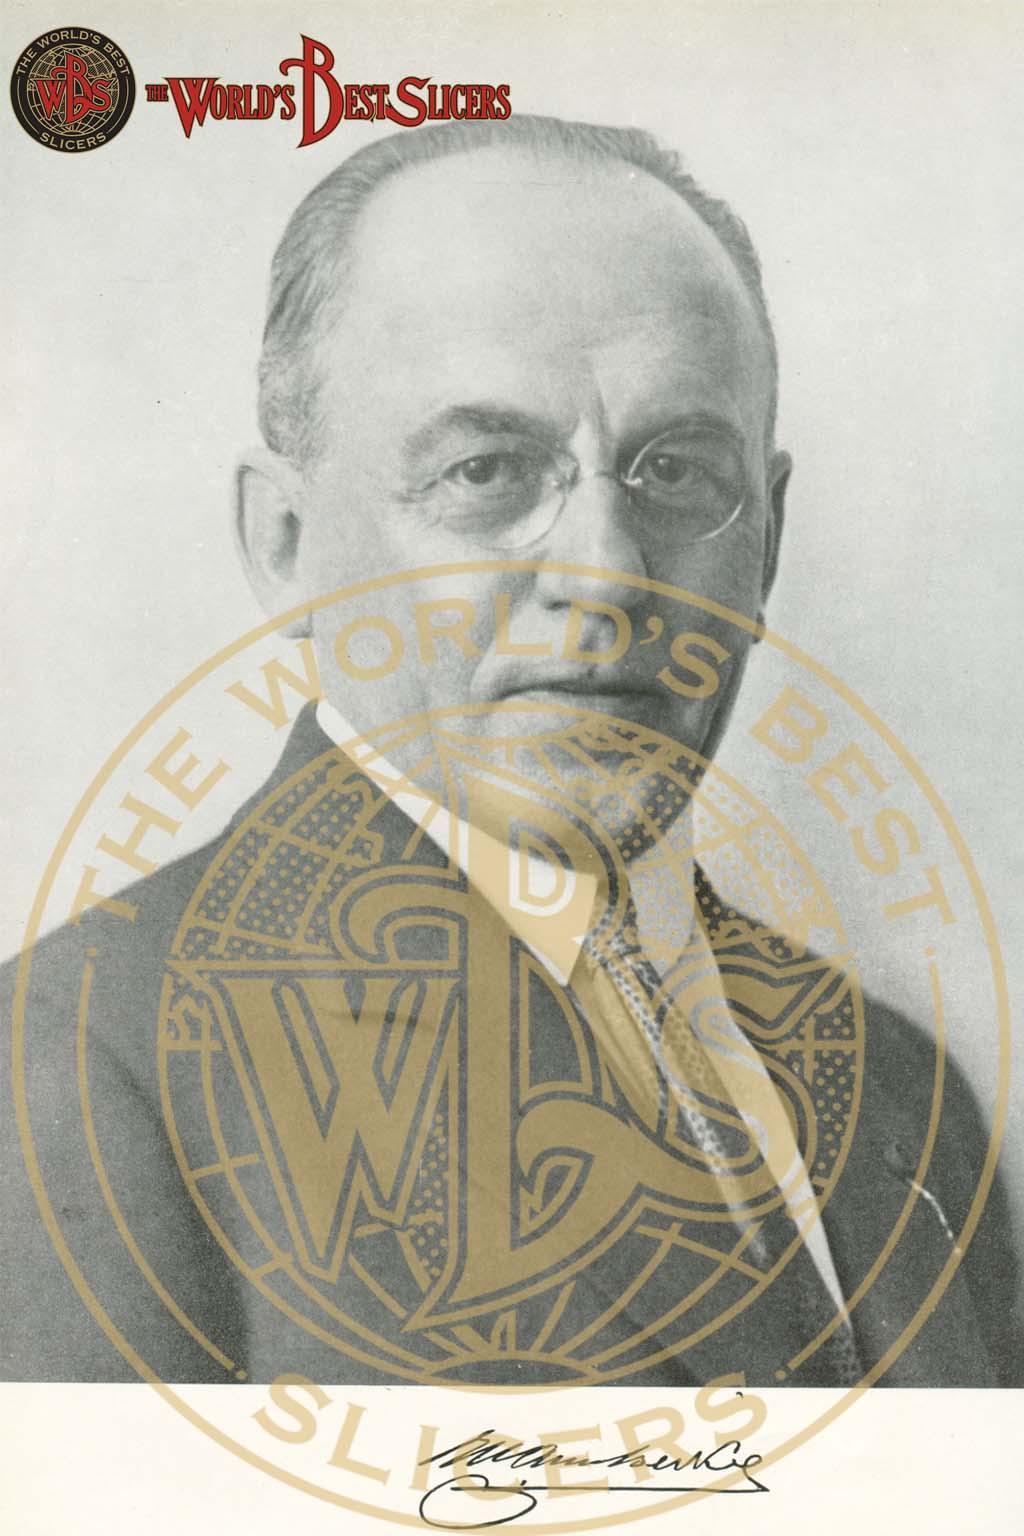 W.v.Berkel W.A.Van Berkel's Geschichte